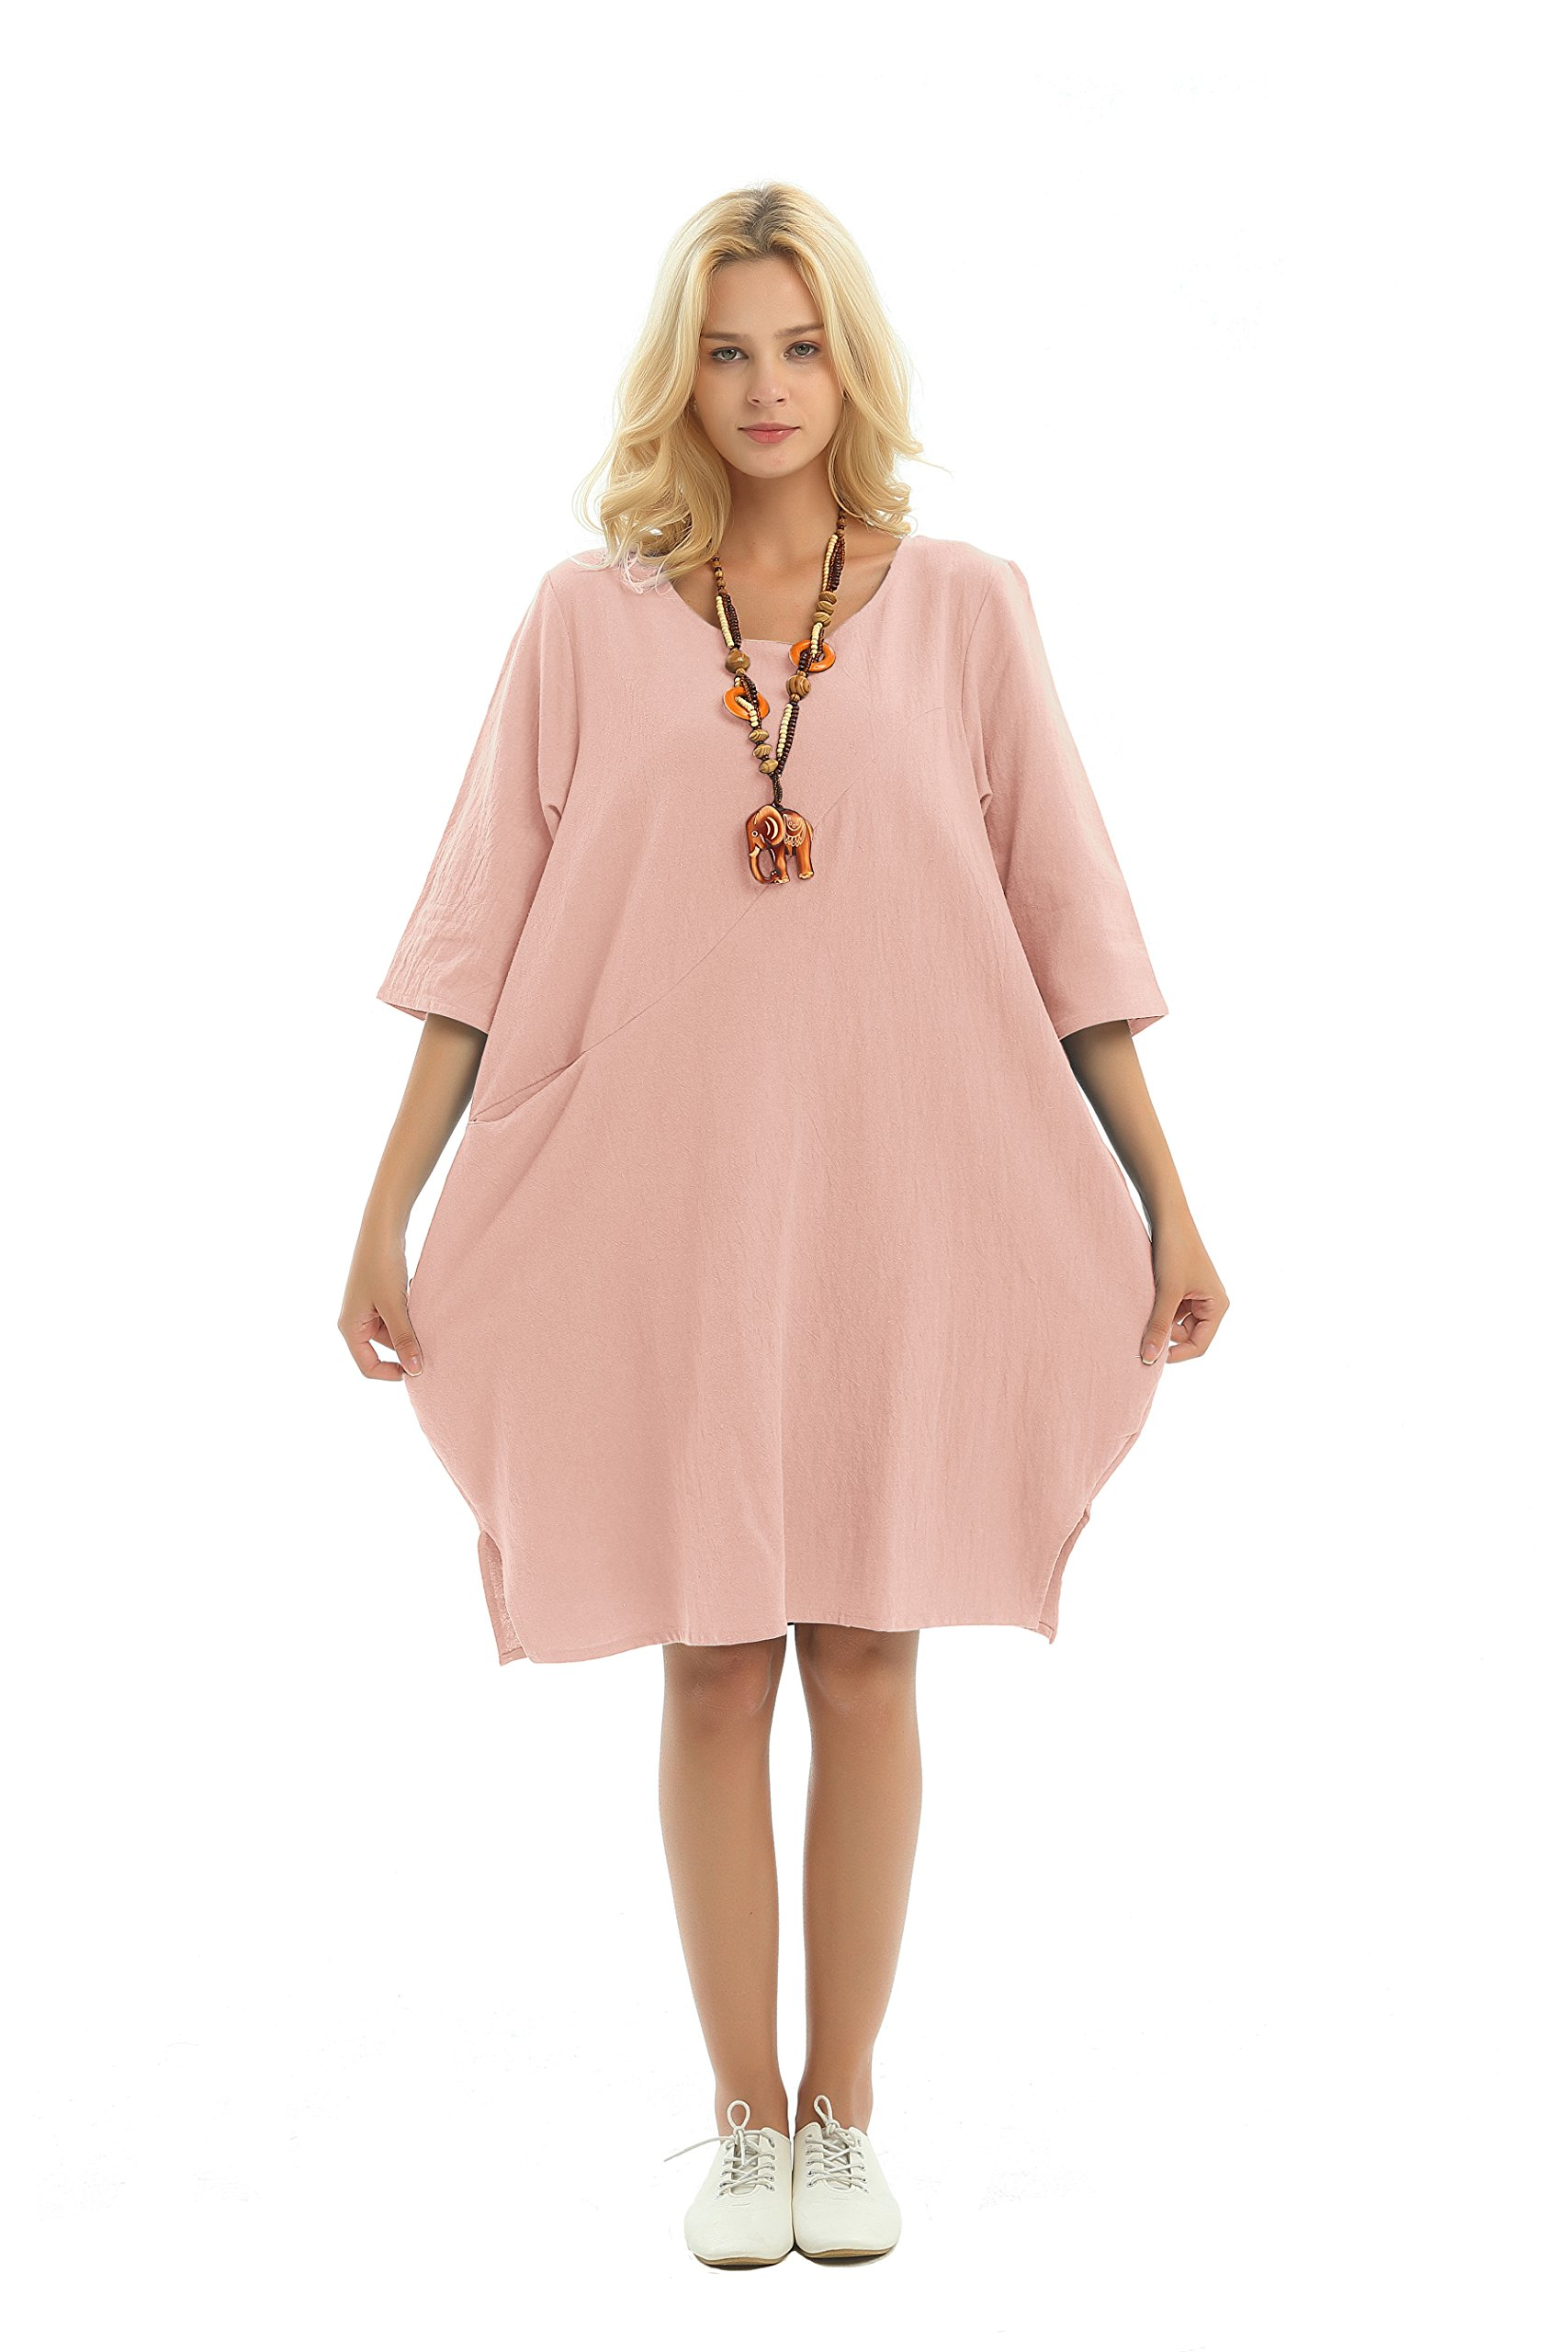 Anysize Side Slit Pockets Soft Linen Cotton Spring Summer Dress Plus Size  Dress F155A Skin Pink